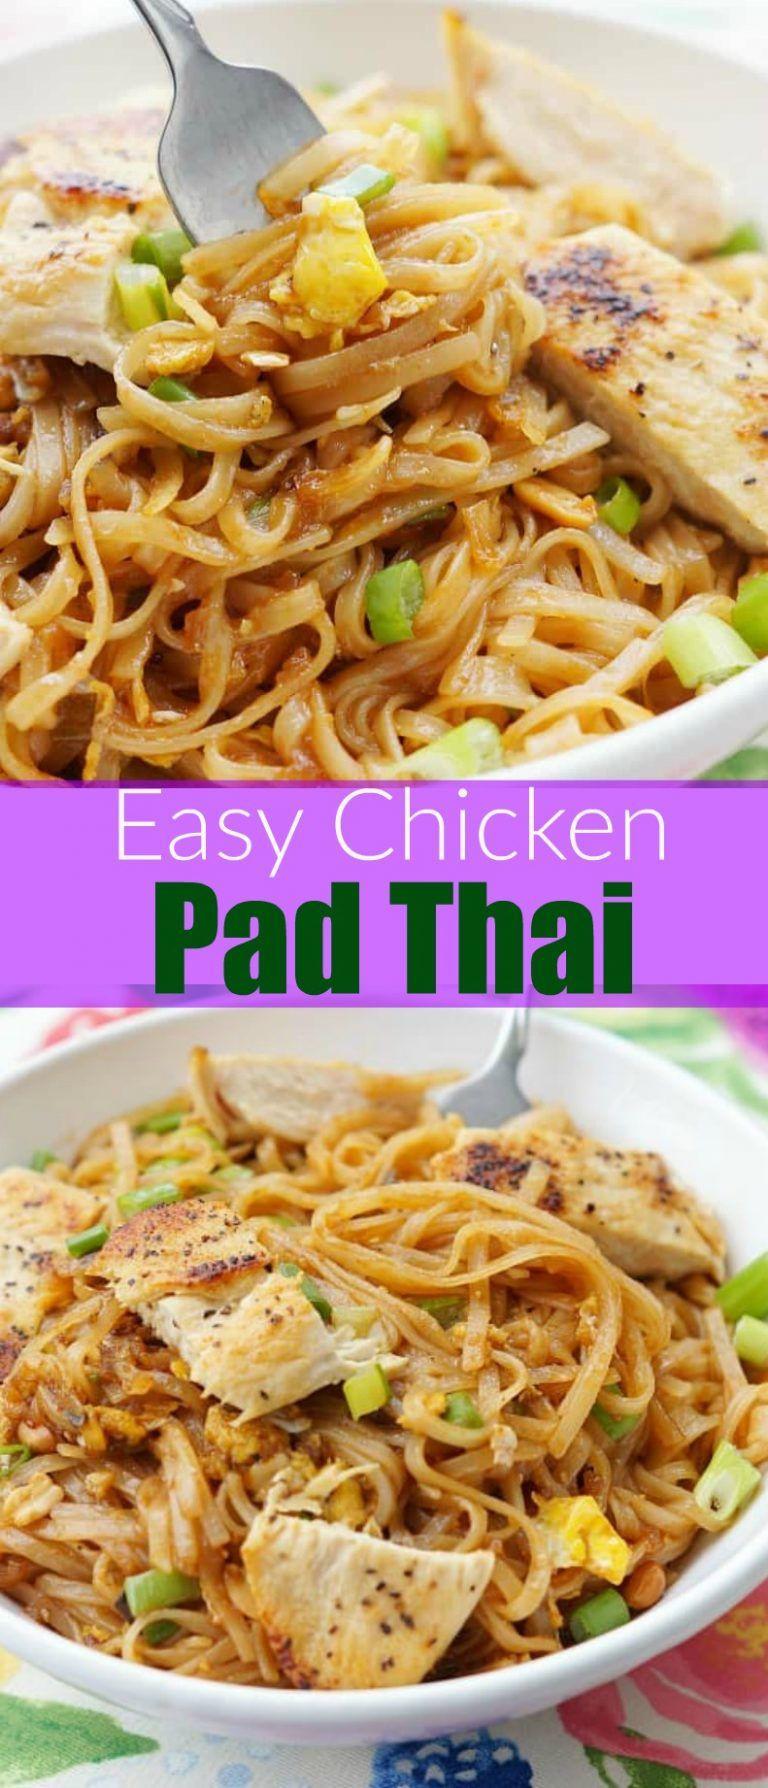 Chicken Pad Thai Calories Restaurant  Easy Chicken Pad Thai Recipe